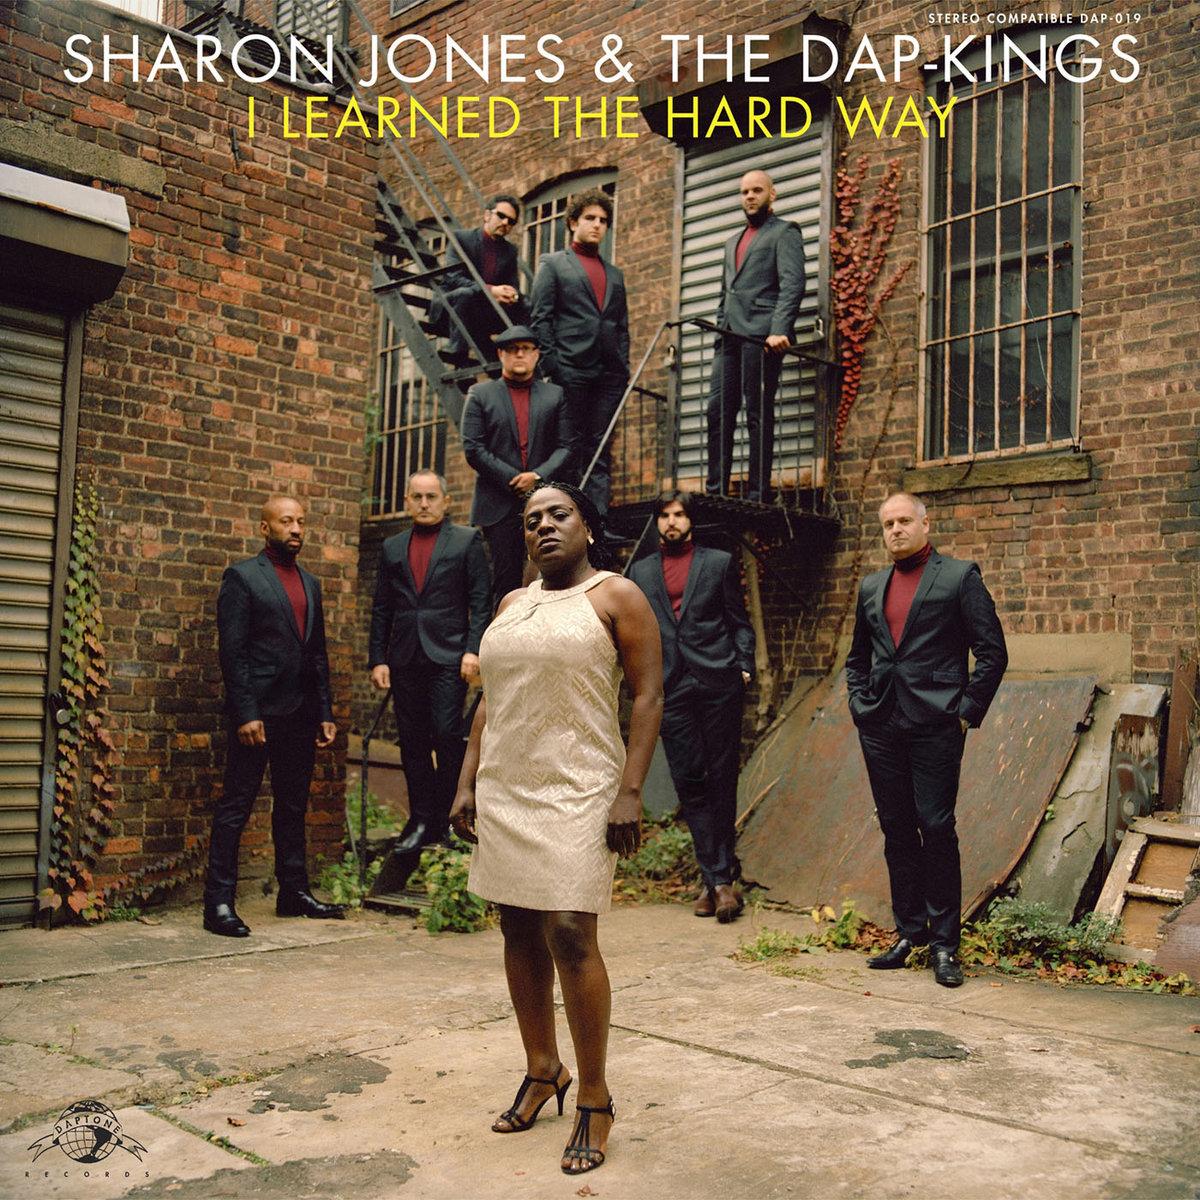 Sharon Jones & the Dap-Kings, I Learned the Hard Way